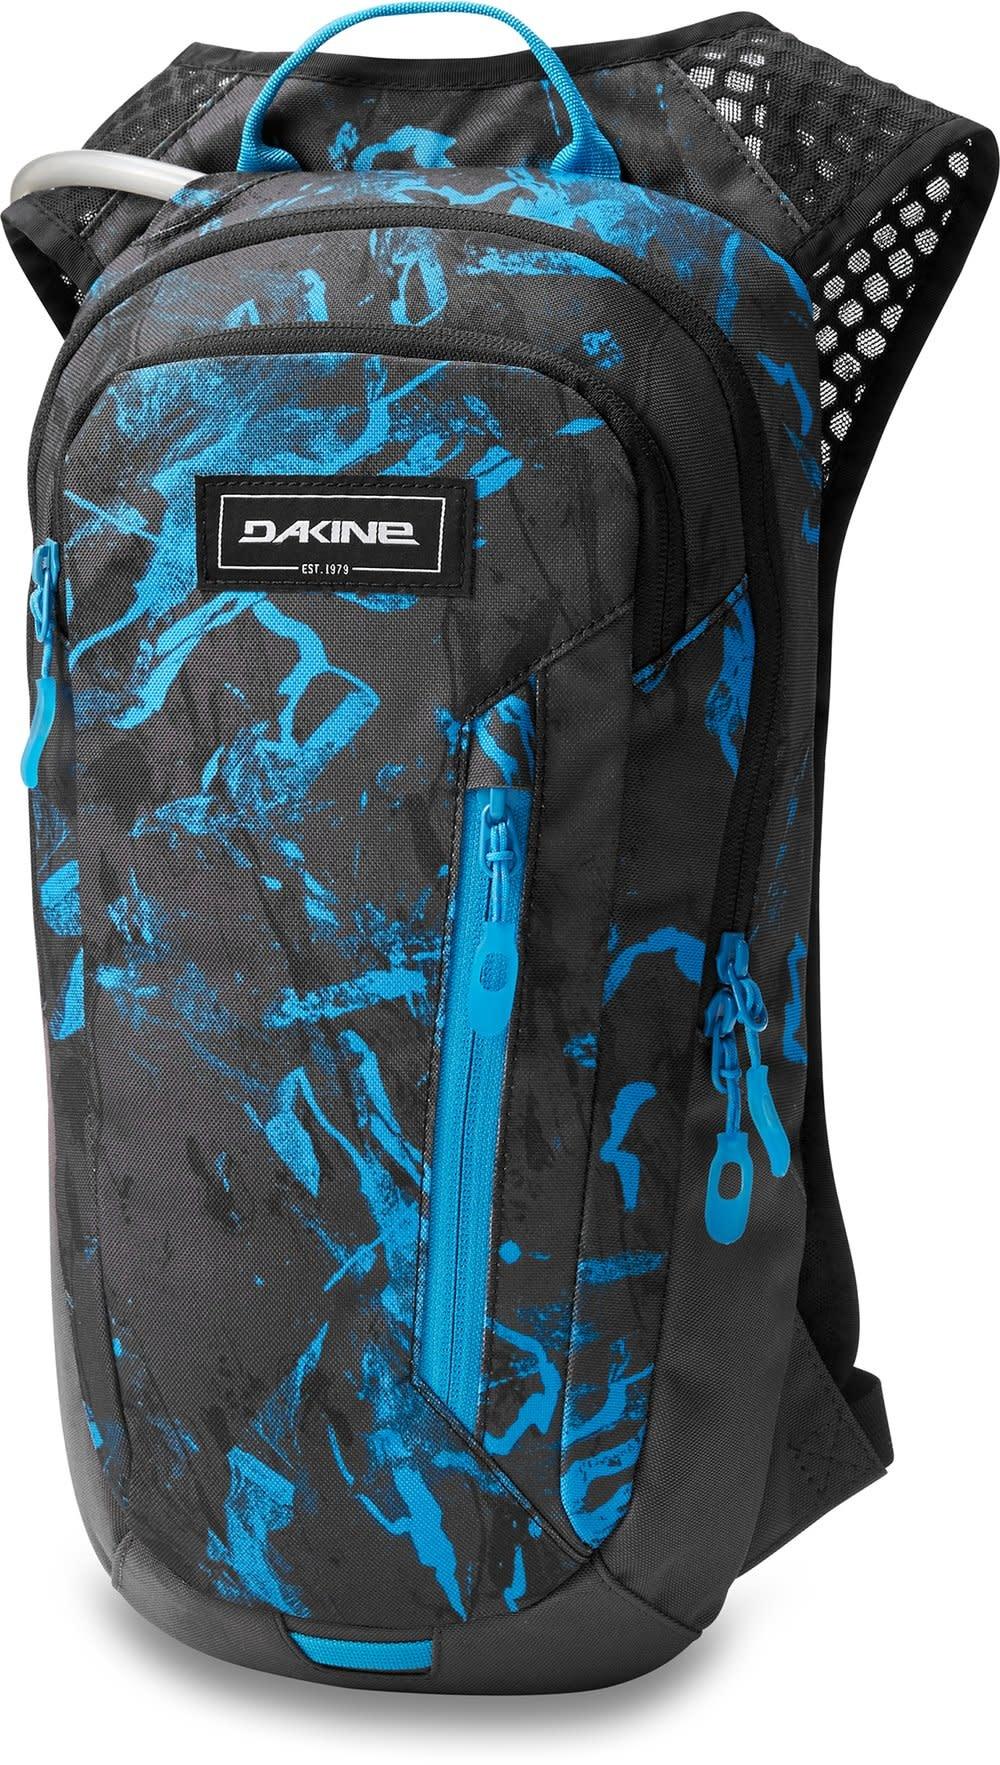 Hydration pack, Dakine Shuttle 6L